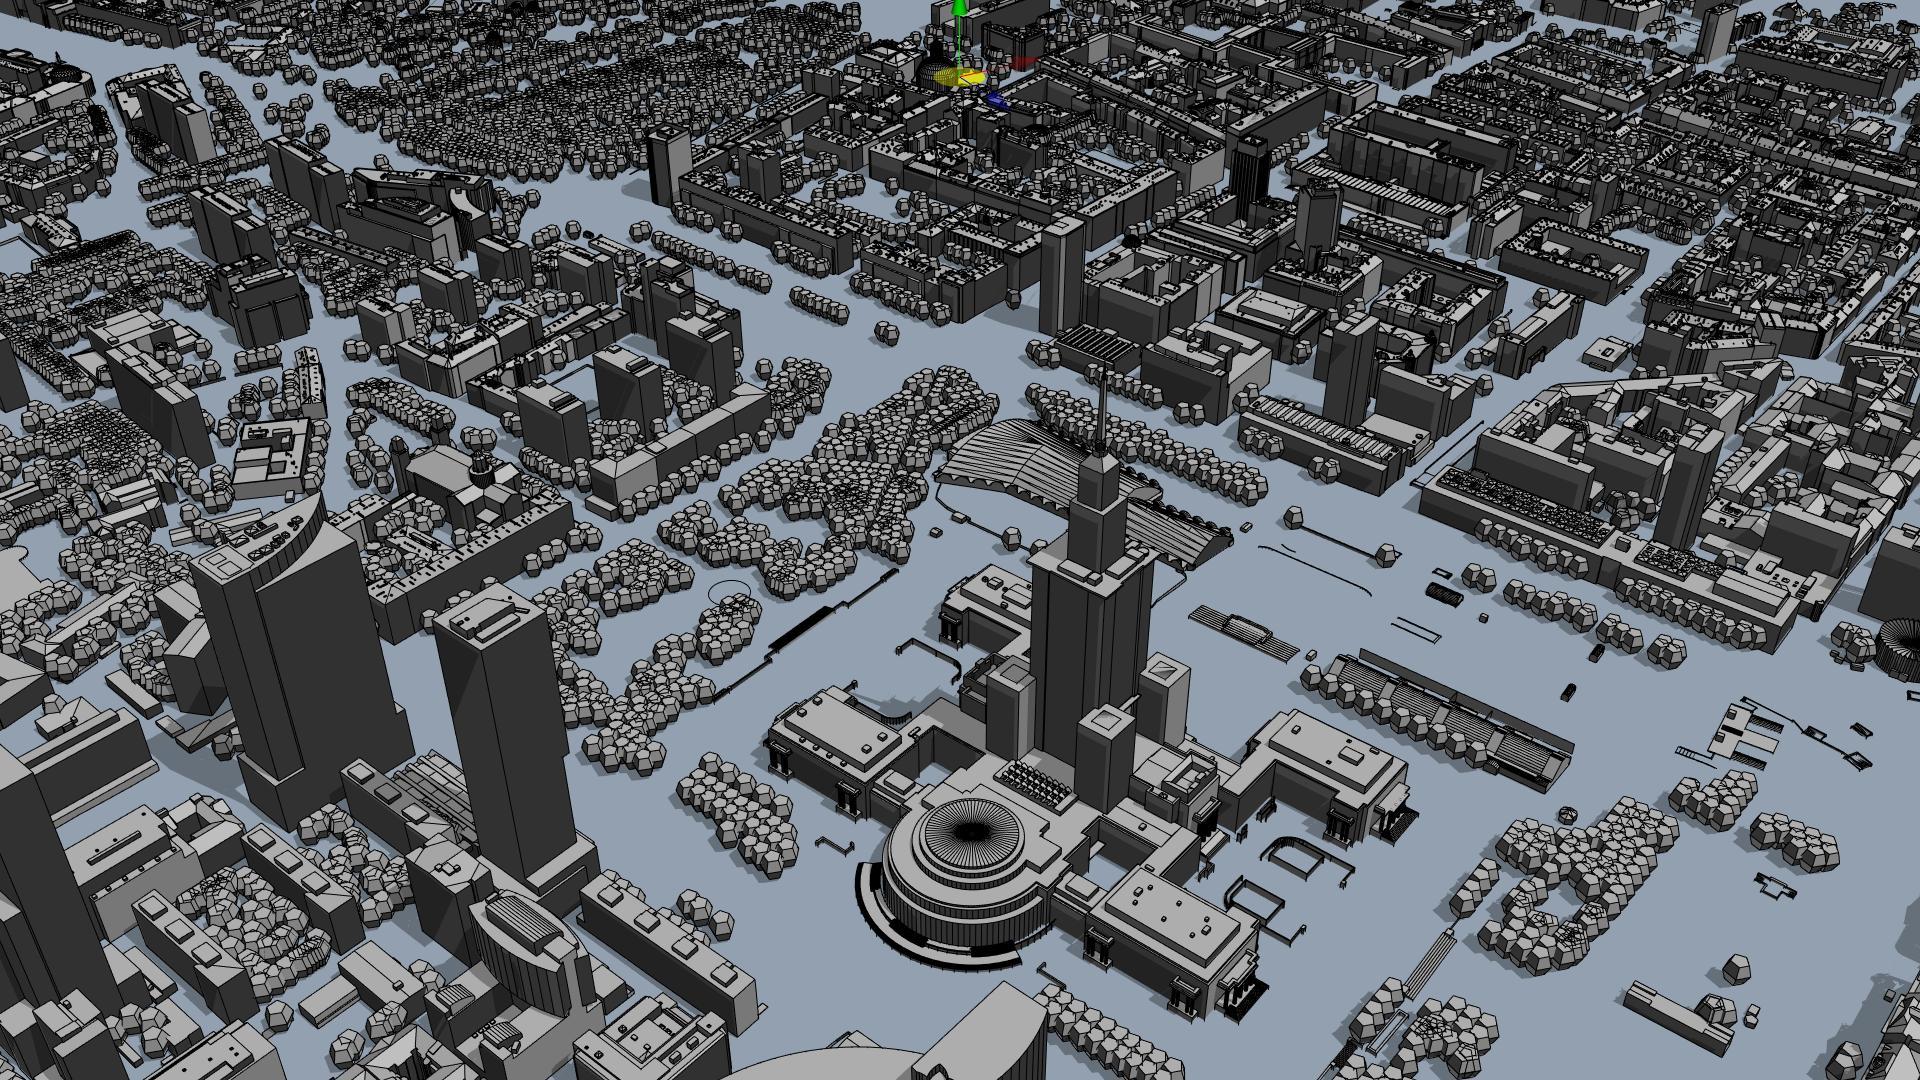 Rys. 4. Warszawa - widok modelu